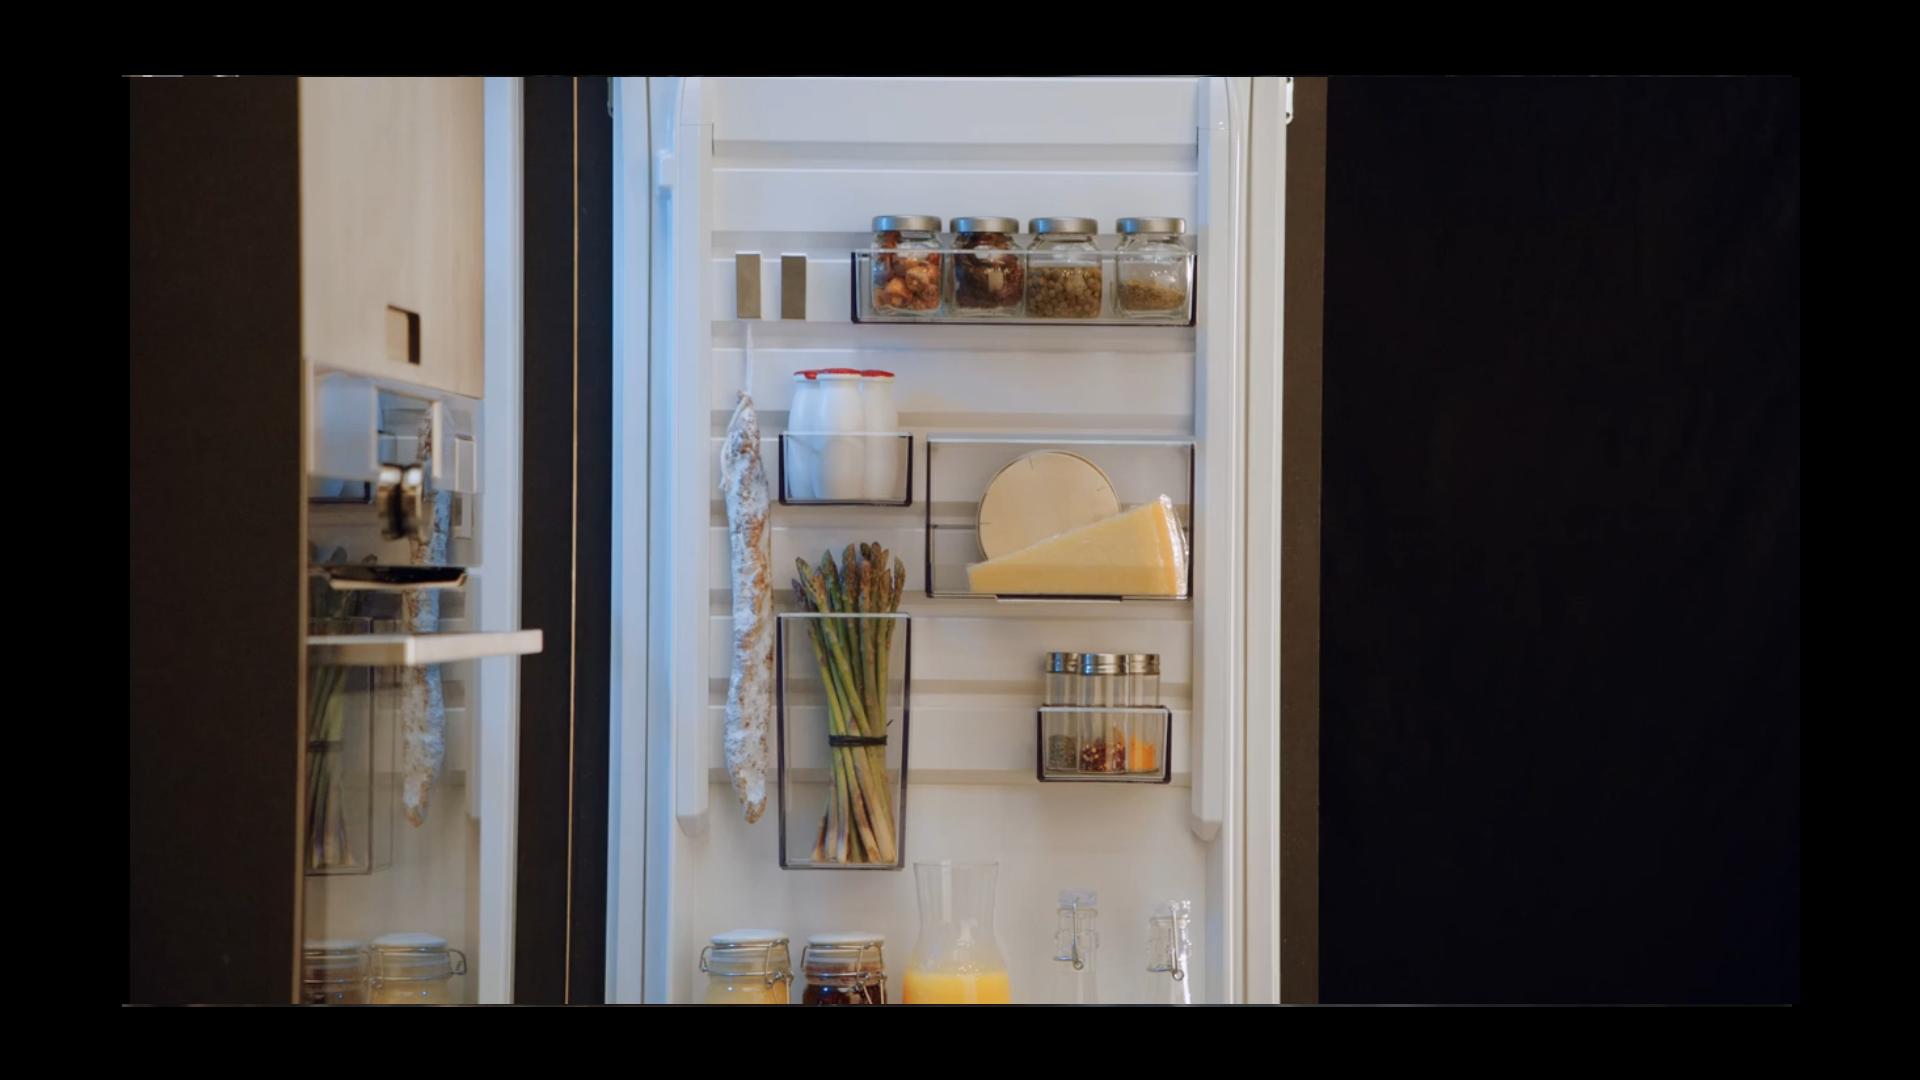 Aeg Kühlschrank Filter Wechseln : Aeg kühlschrank mit customflex elektrogeräte pirmasens